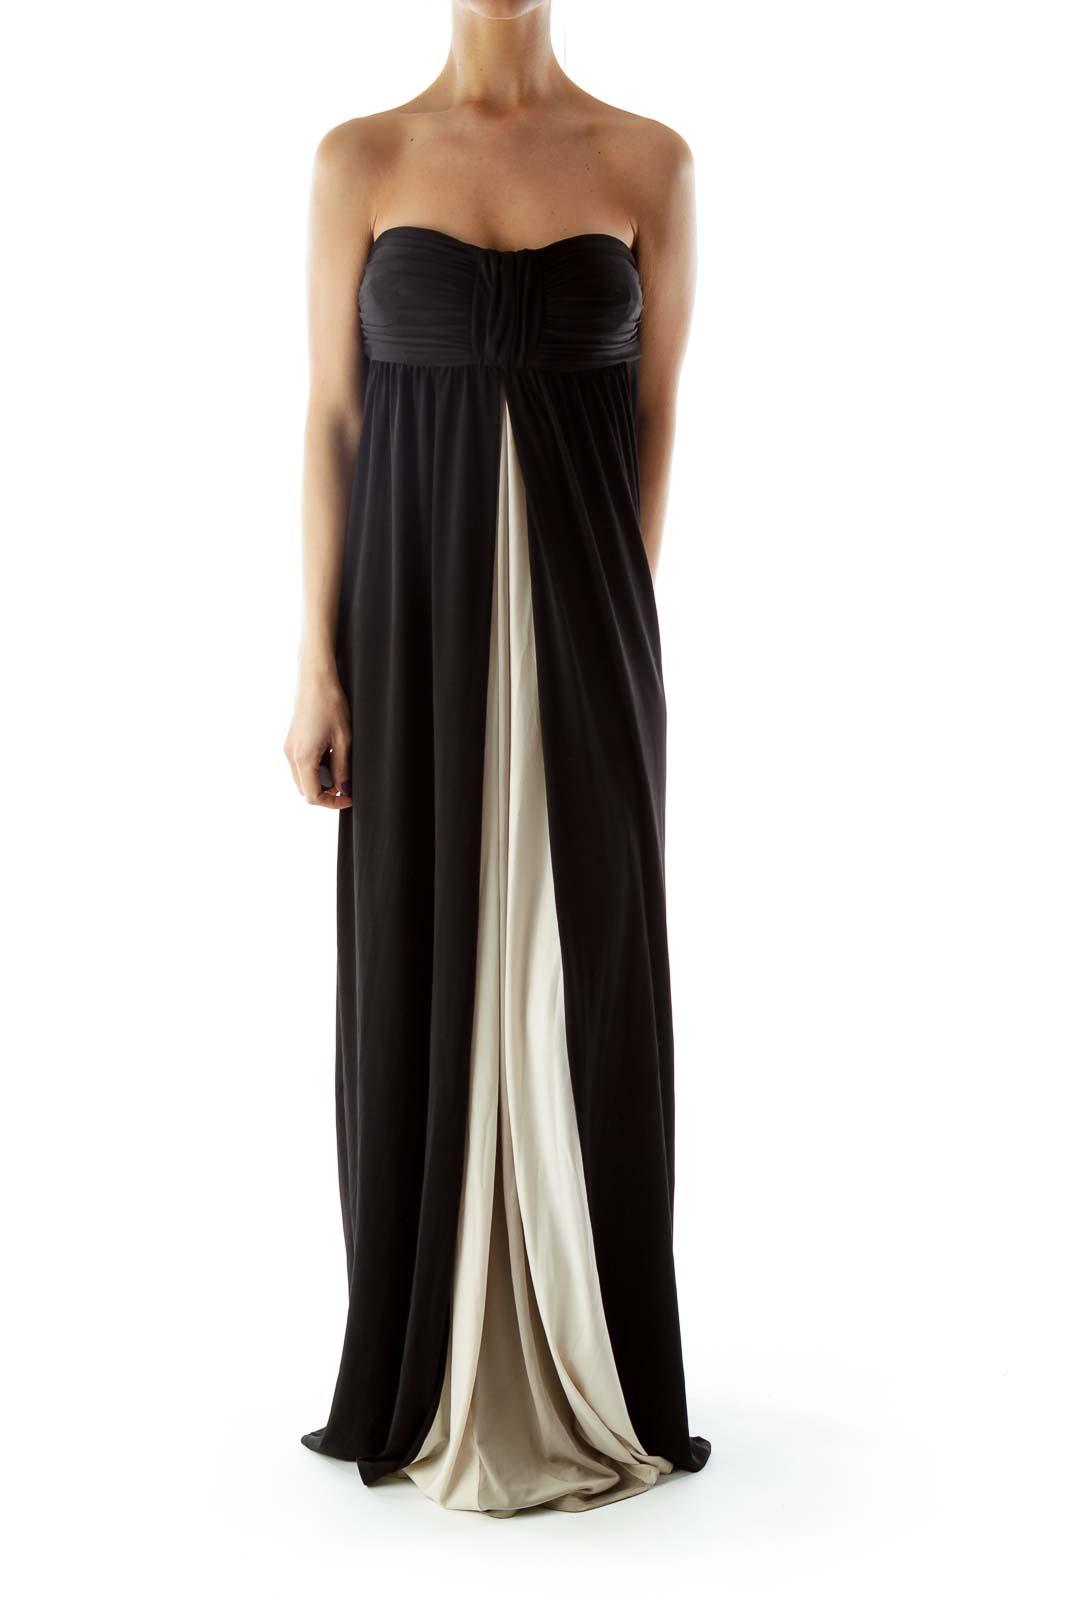 Black Strapless Color Block Evening Dress Front